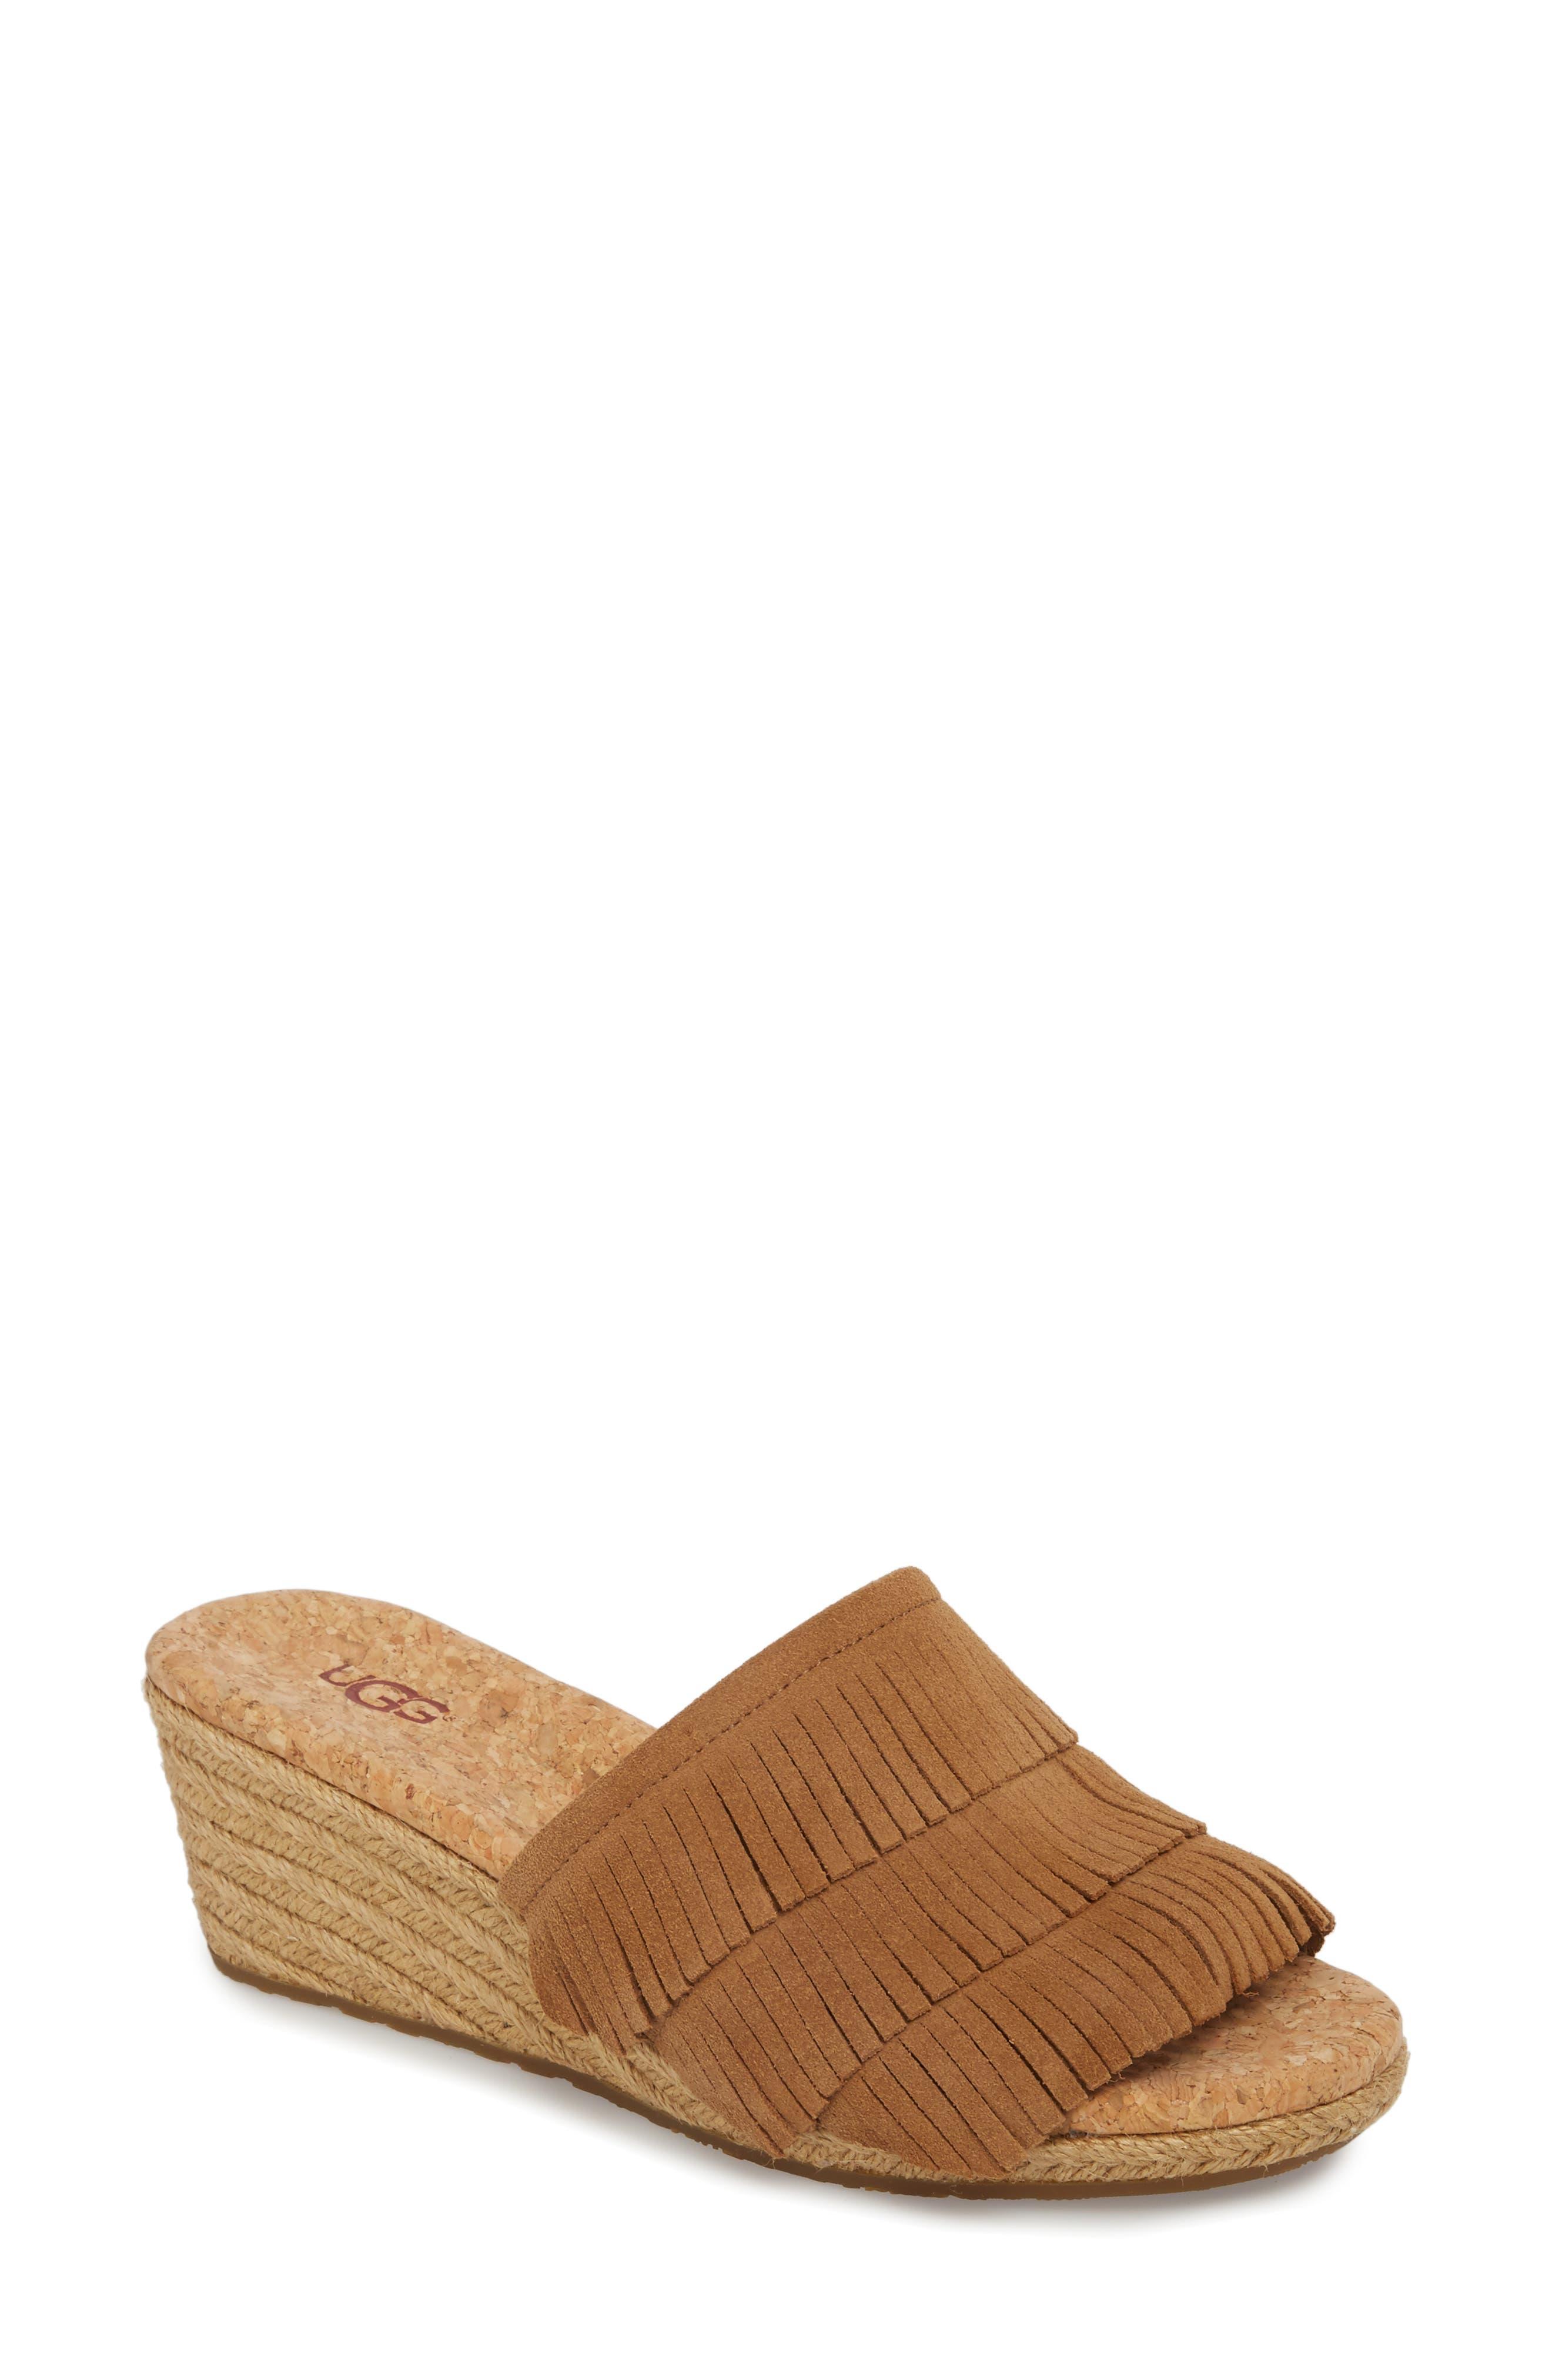 Kendra Fringe Wedge Sandal,                             Main thumbnail 1, color,                             Chestnut Suede